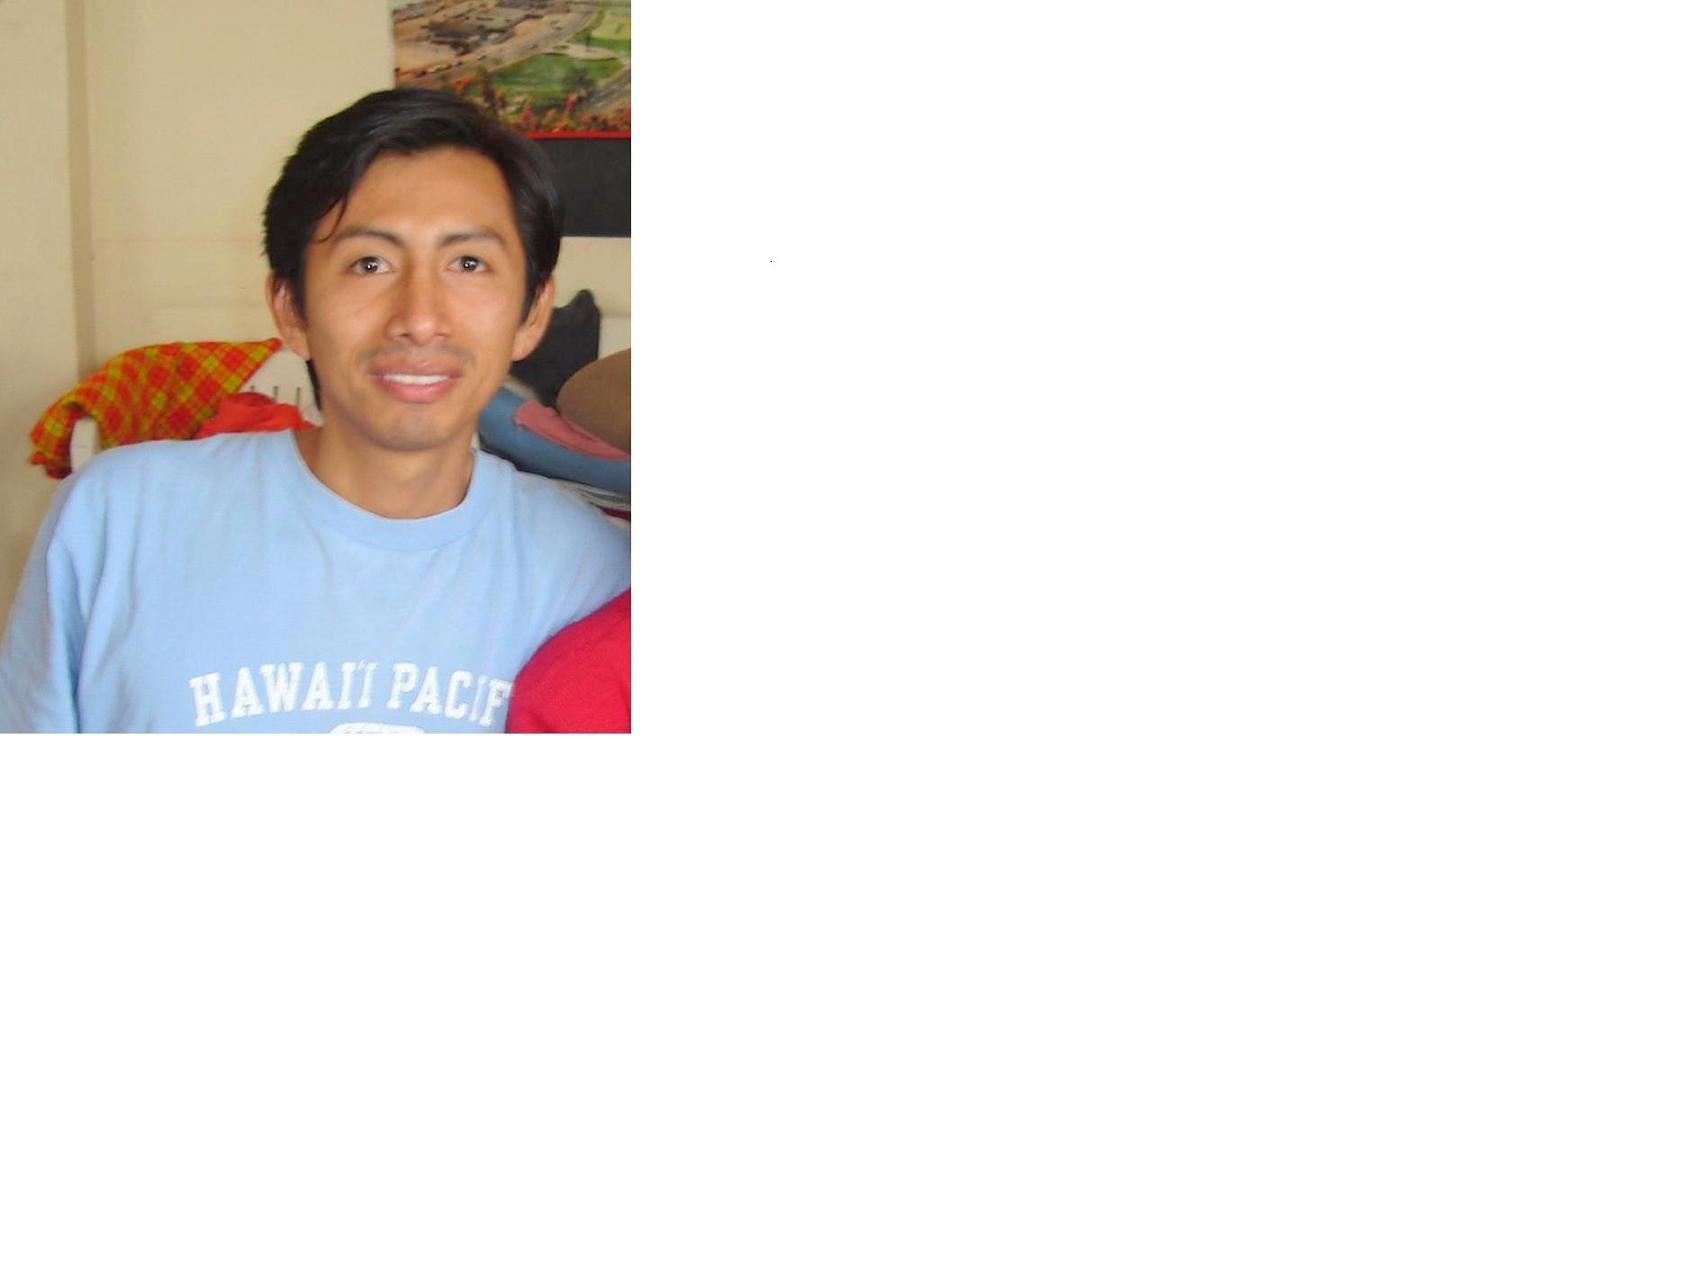 Fernandoleon, Hombre de Lima buscando pareja